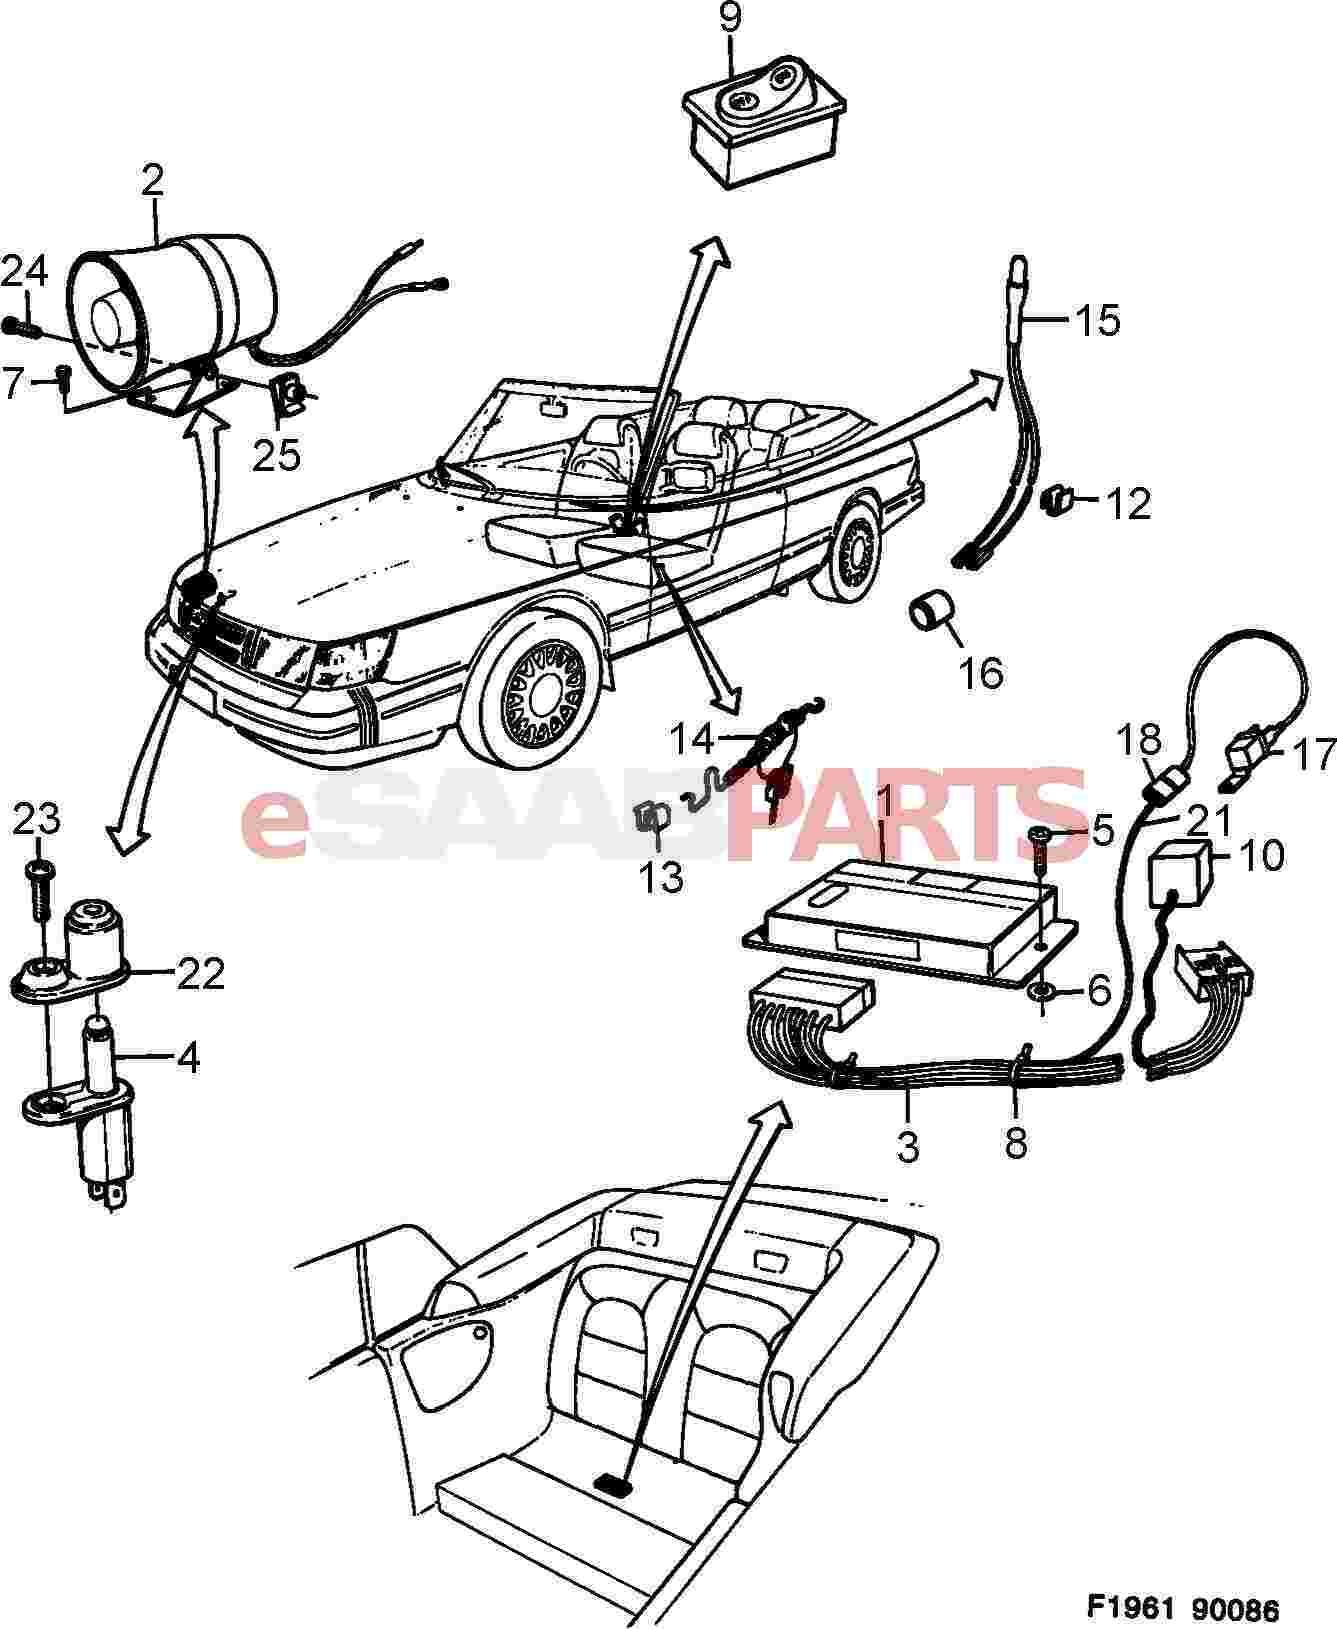 saab 9 3 convertible problems